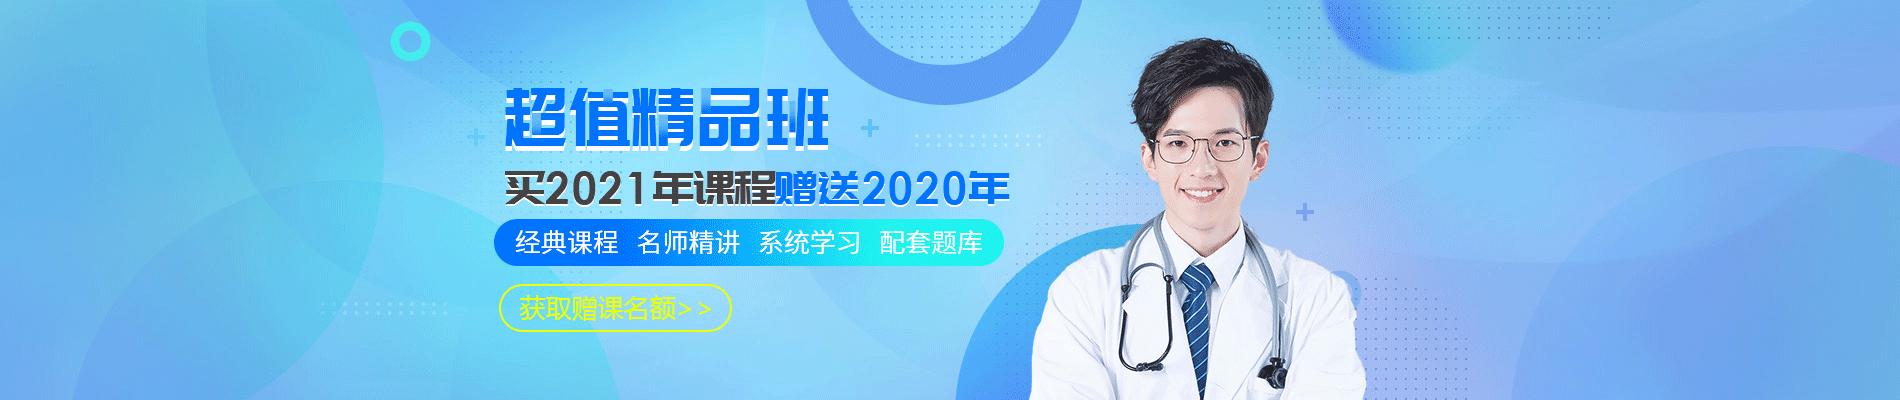 2021临床执业医师课程视频